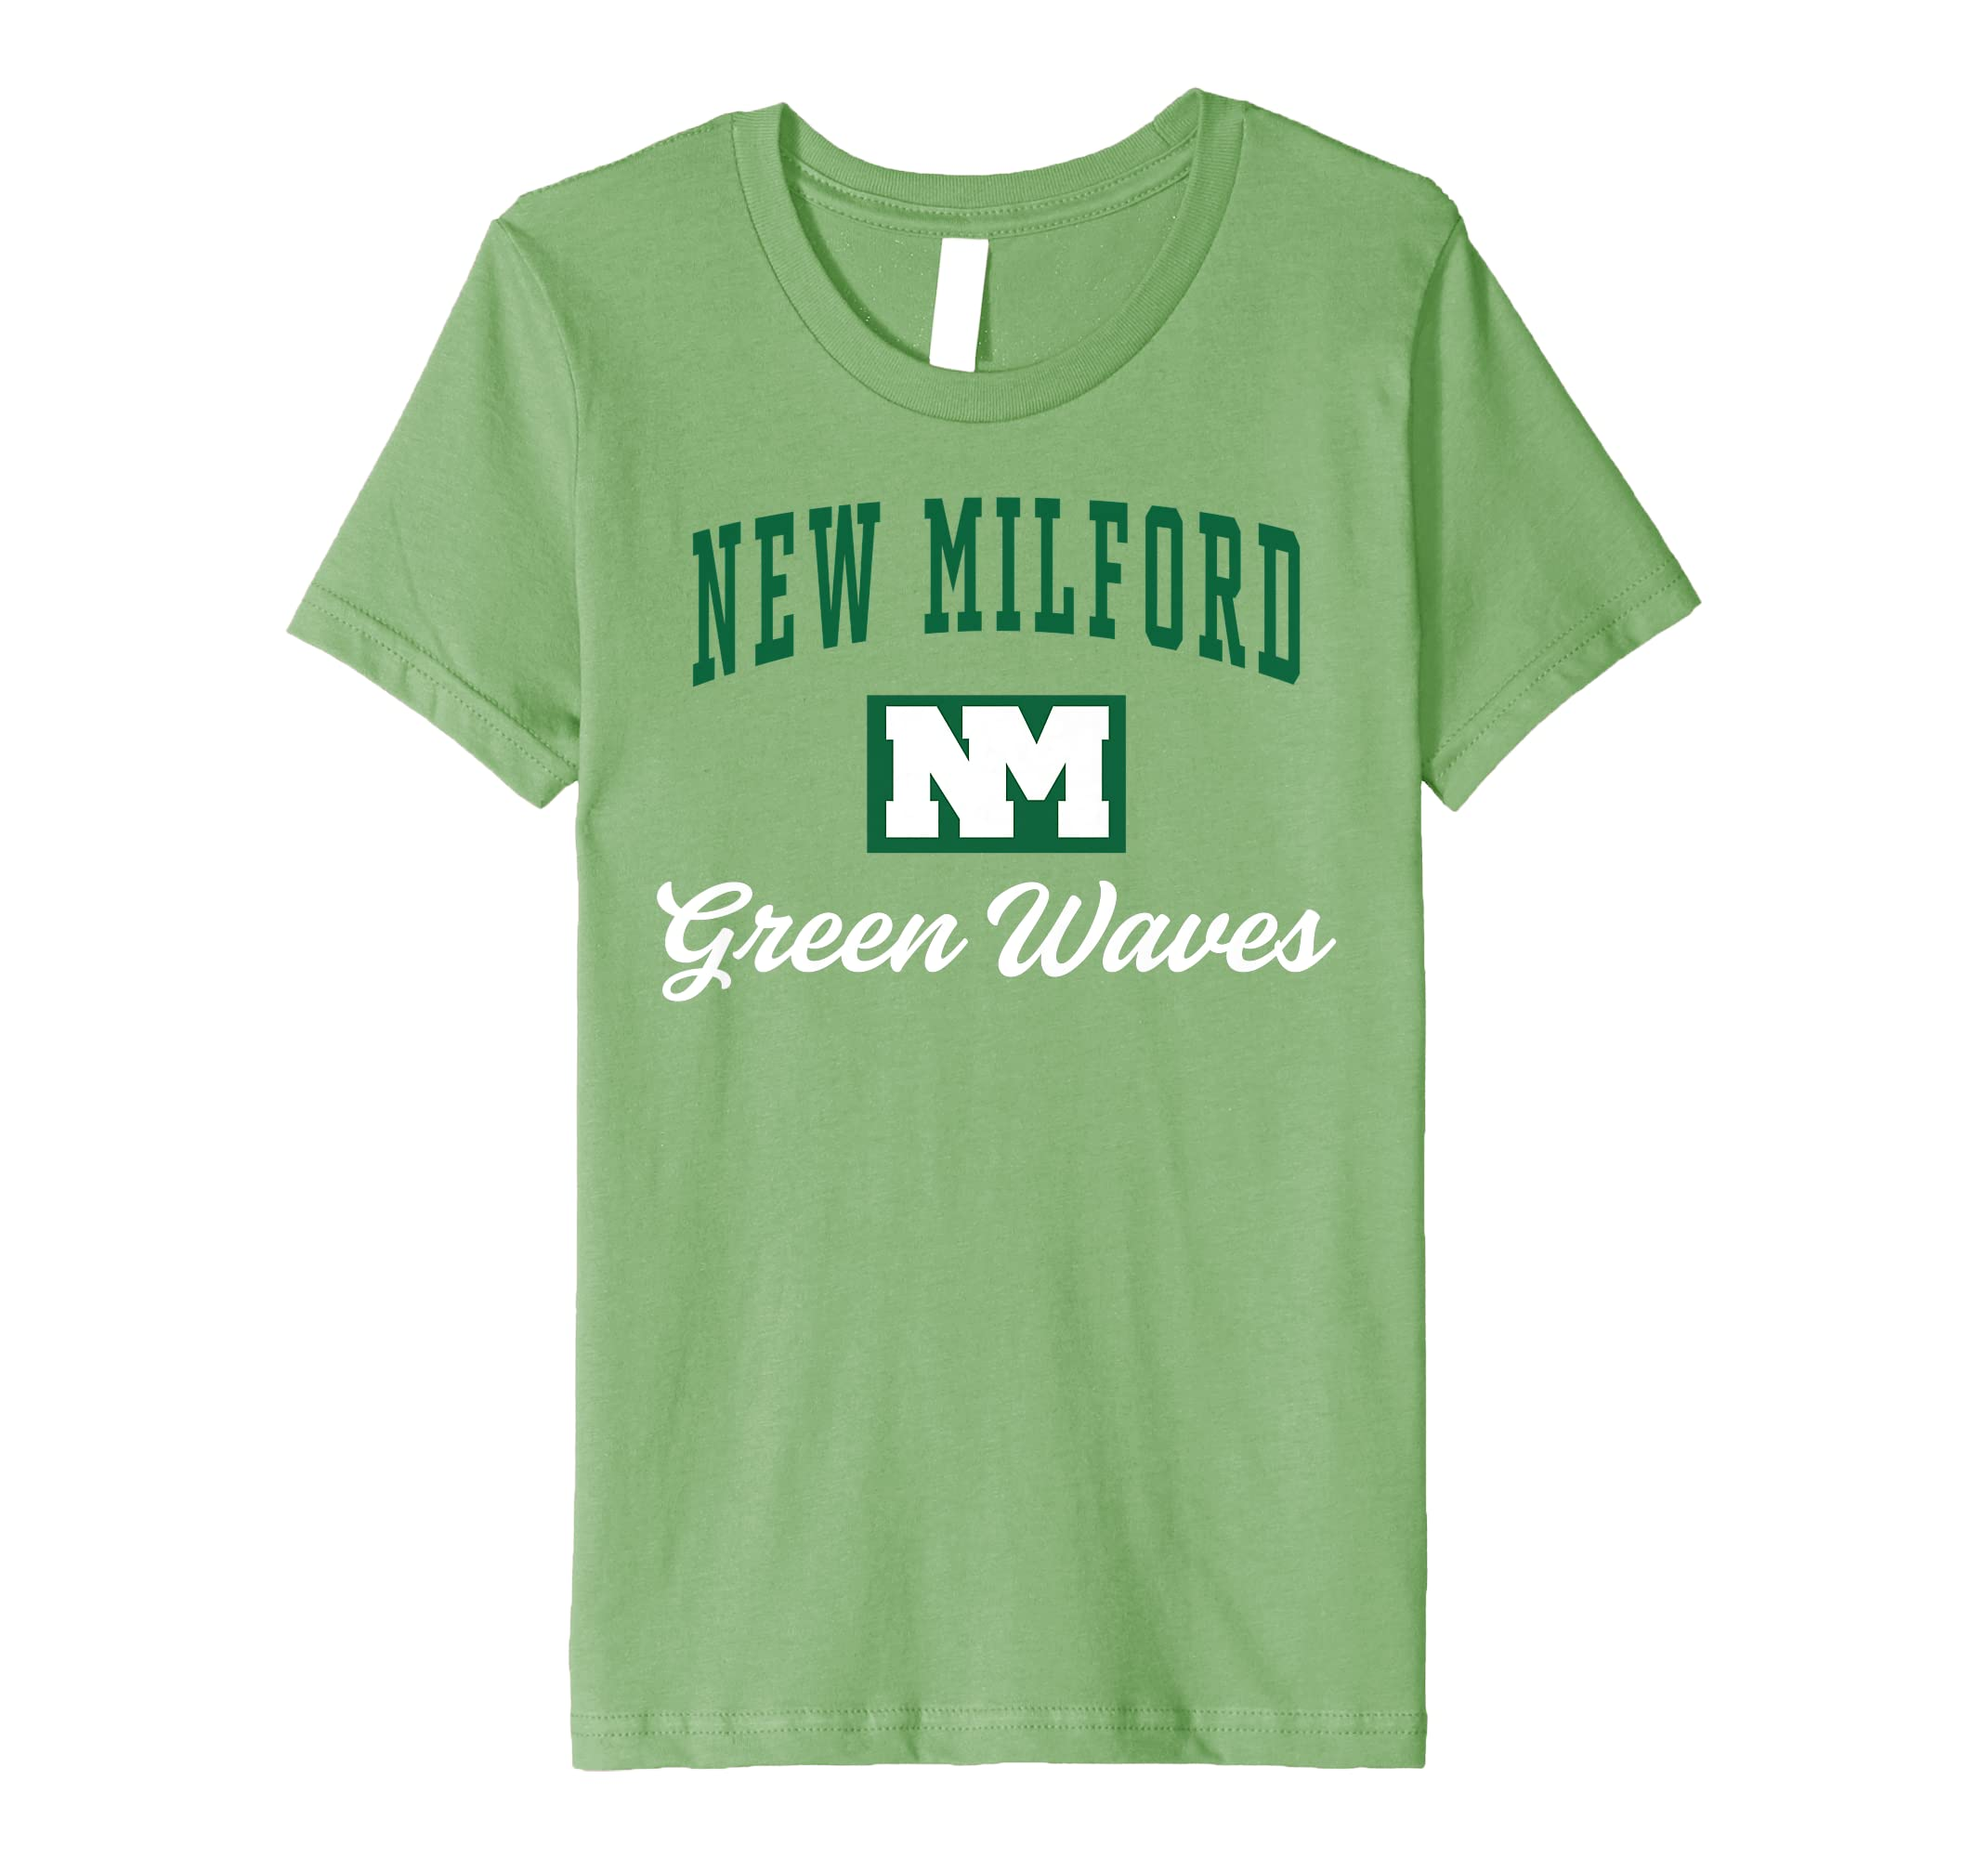 98dfb04f2f92 Amazon.com: New Milford High School Green Waves Premium T-Shirt C3: Clothing